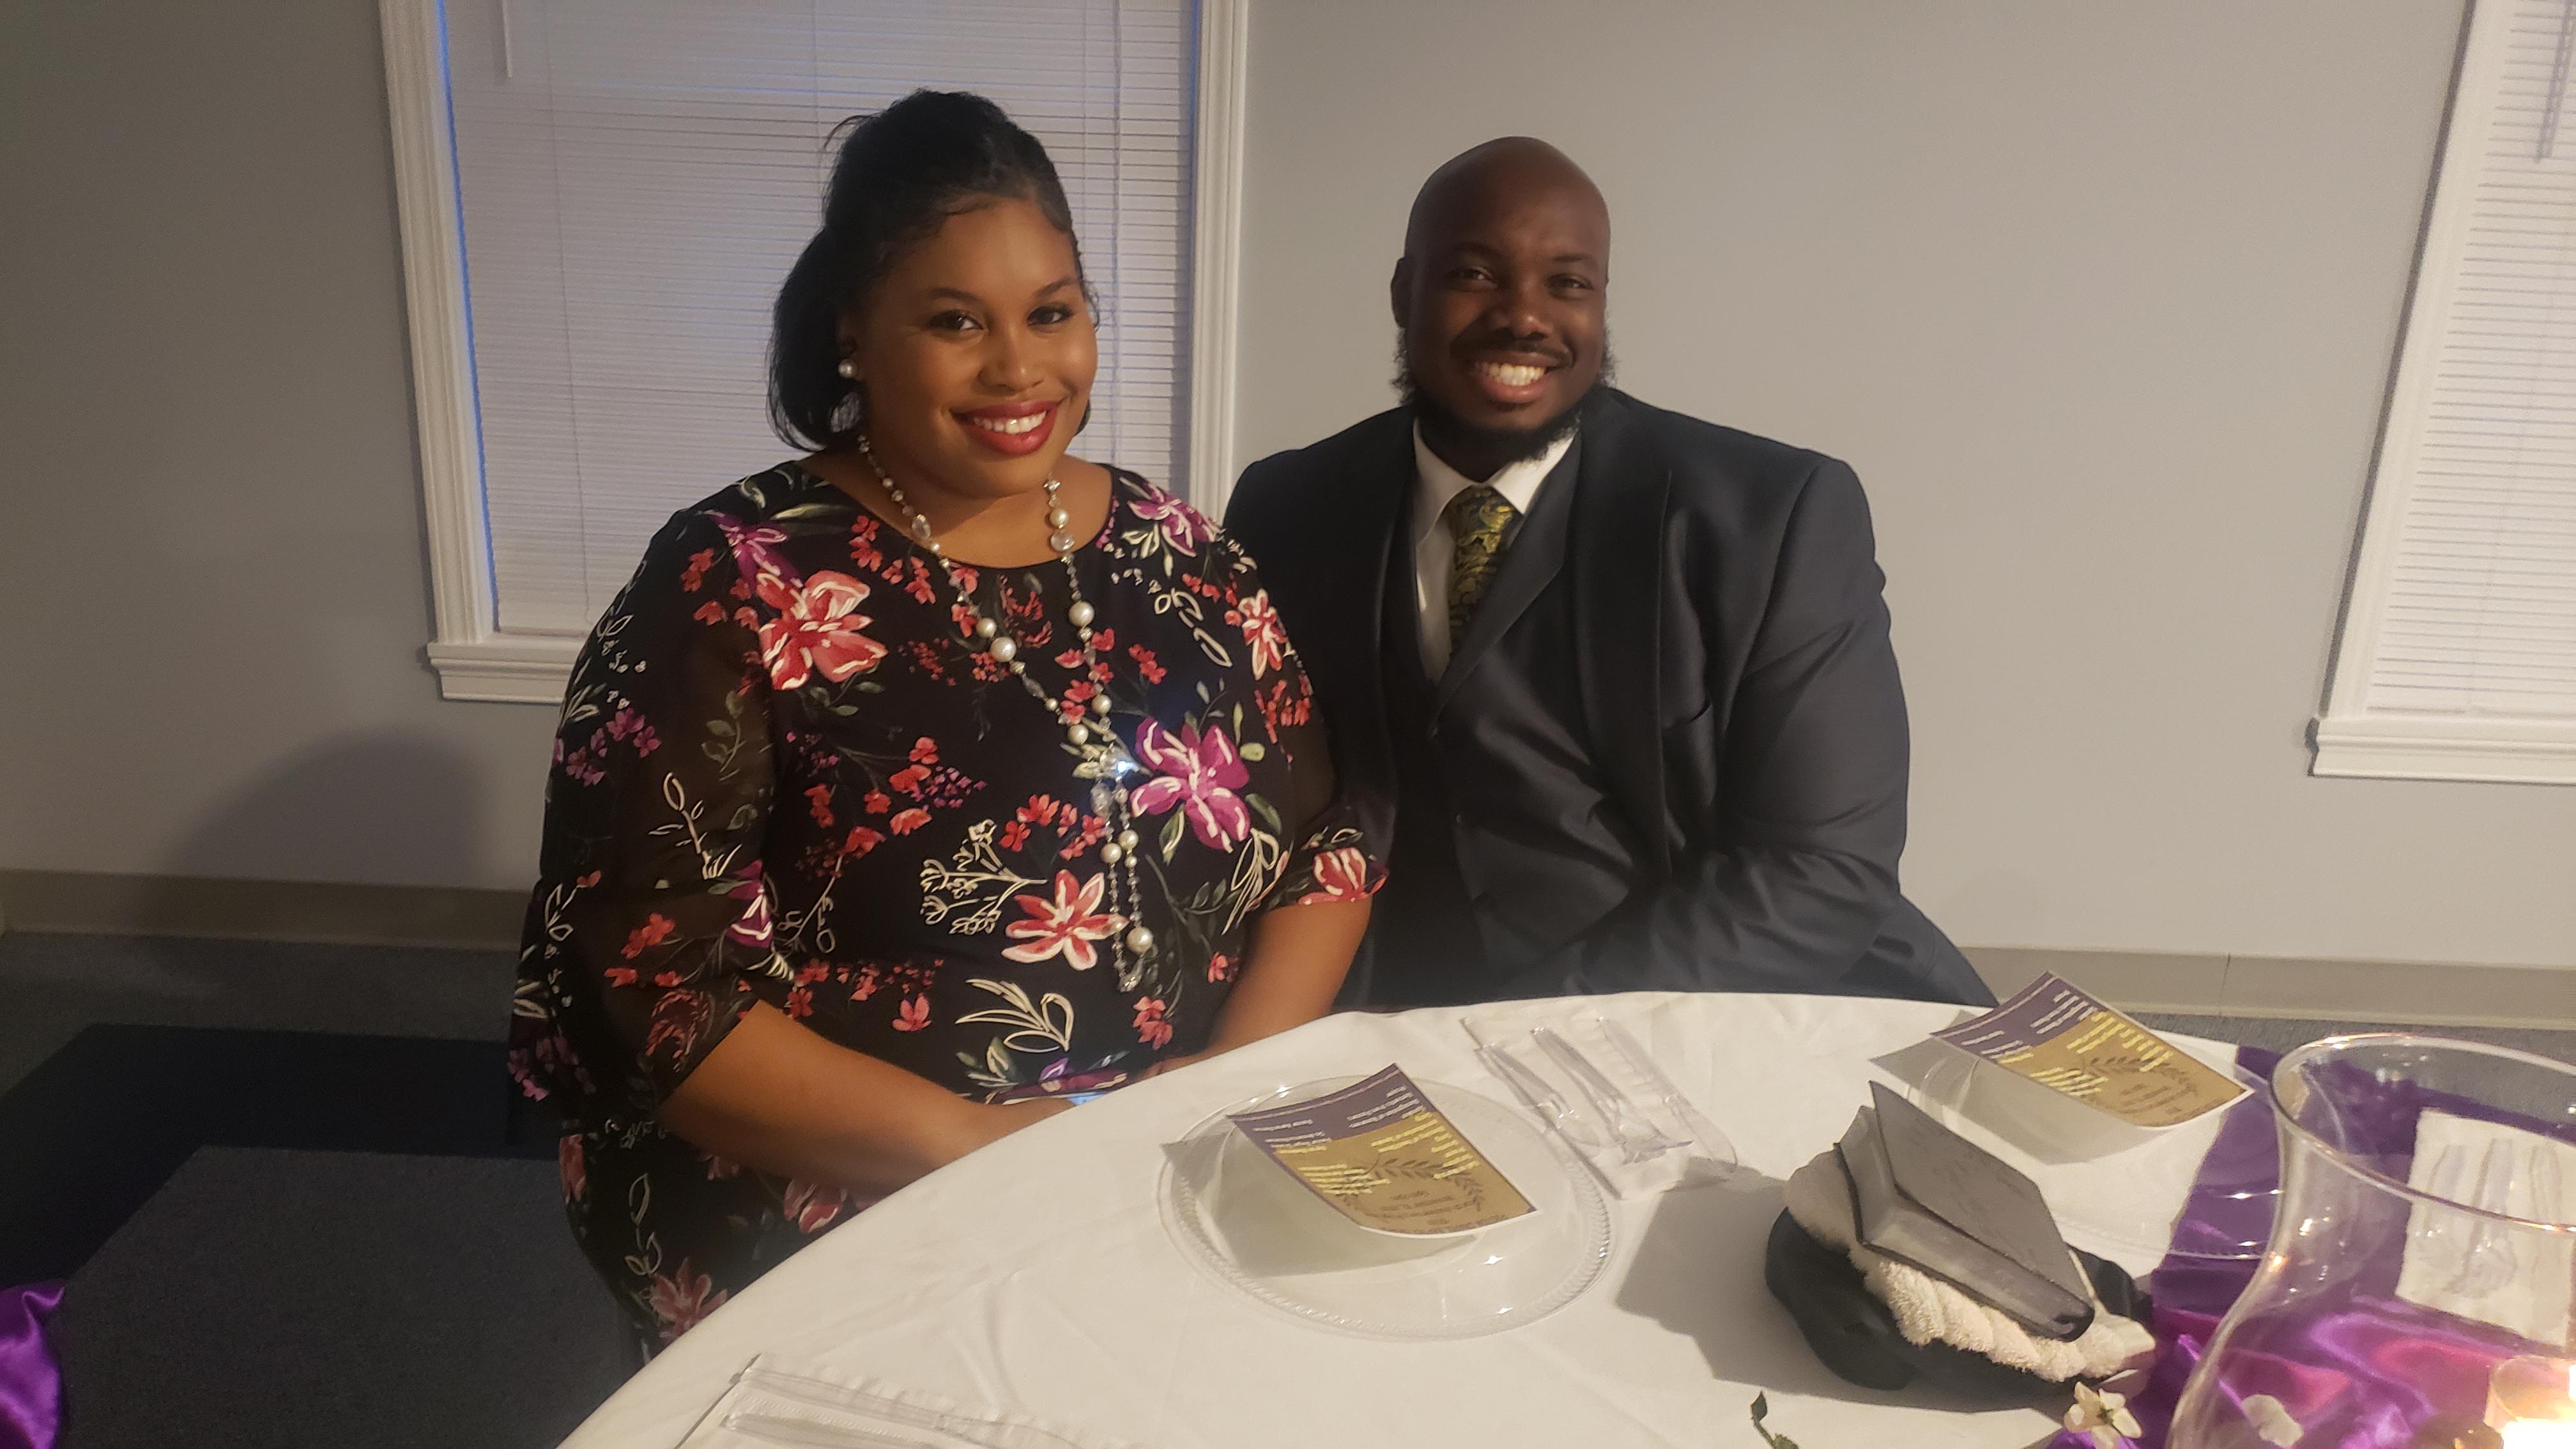 Guest Speaker Pastor & 1st Lady Croney